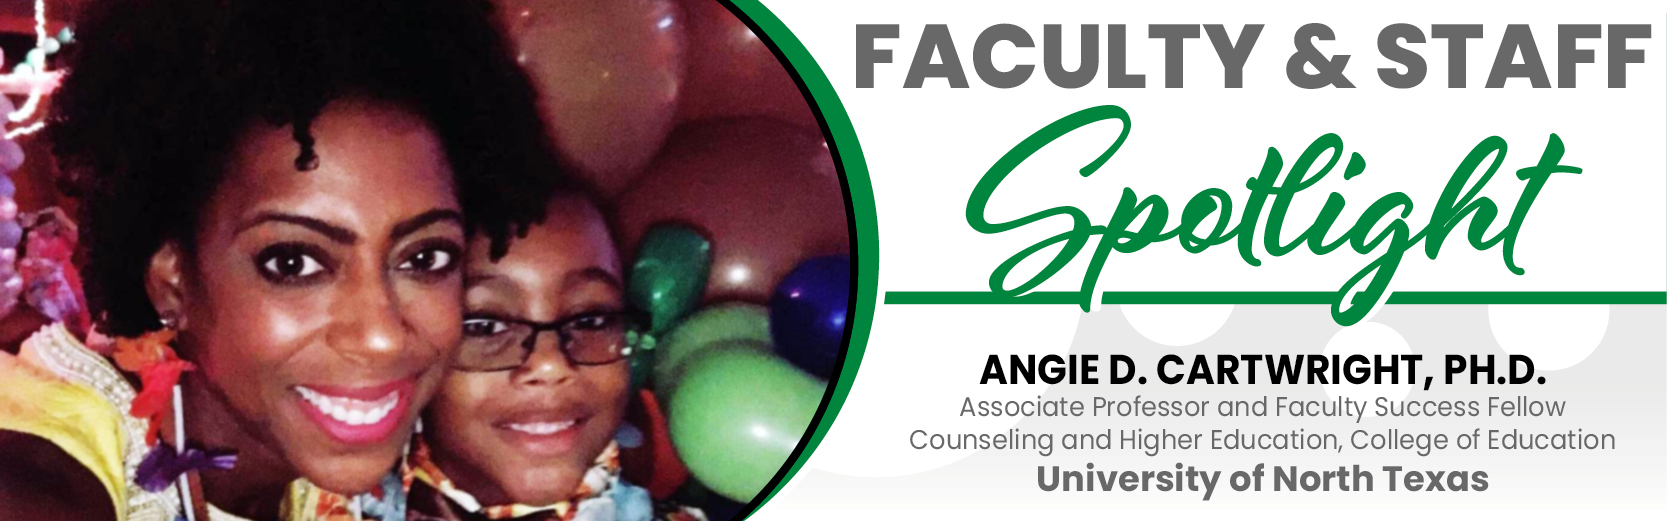 Faculty & Staff Spotlight: Angie D. Cartwright, Ph.D, UNT